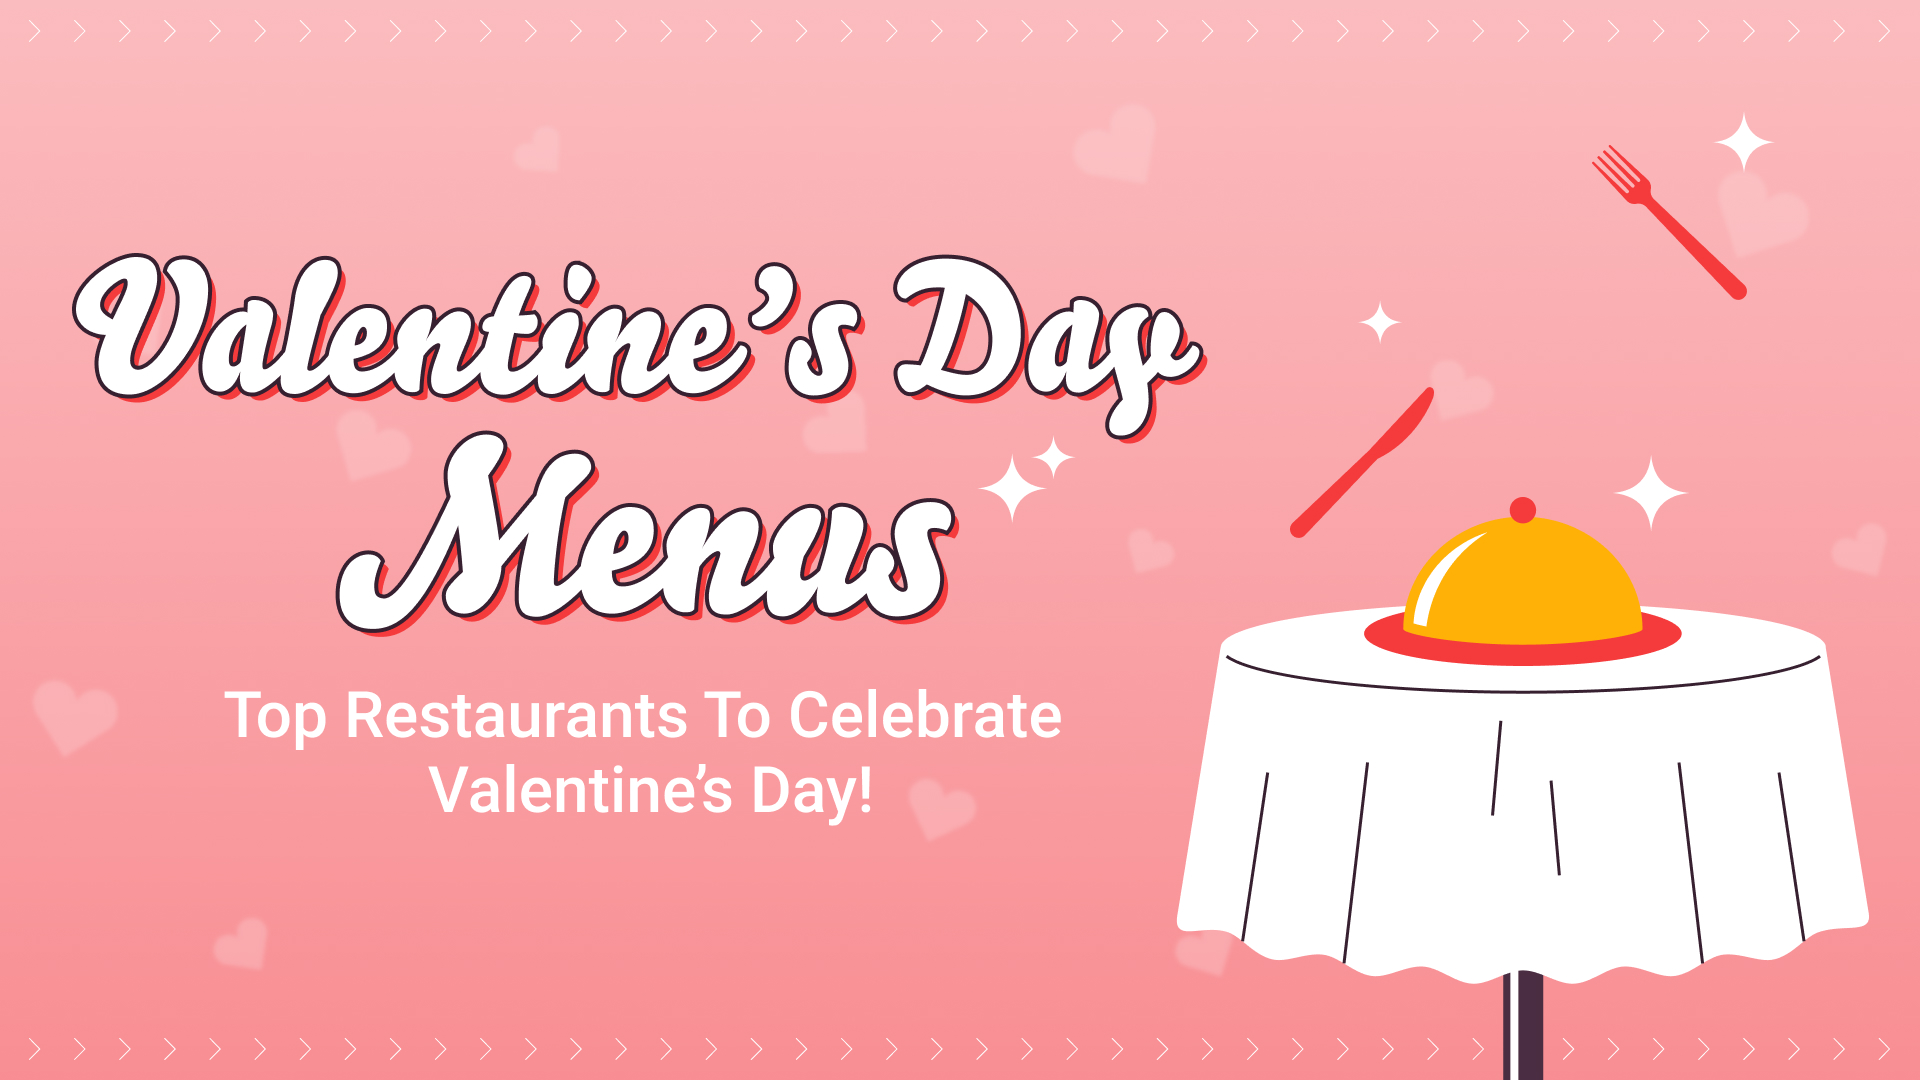 View Valentine's Day Menus in Malaysia